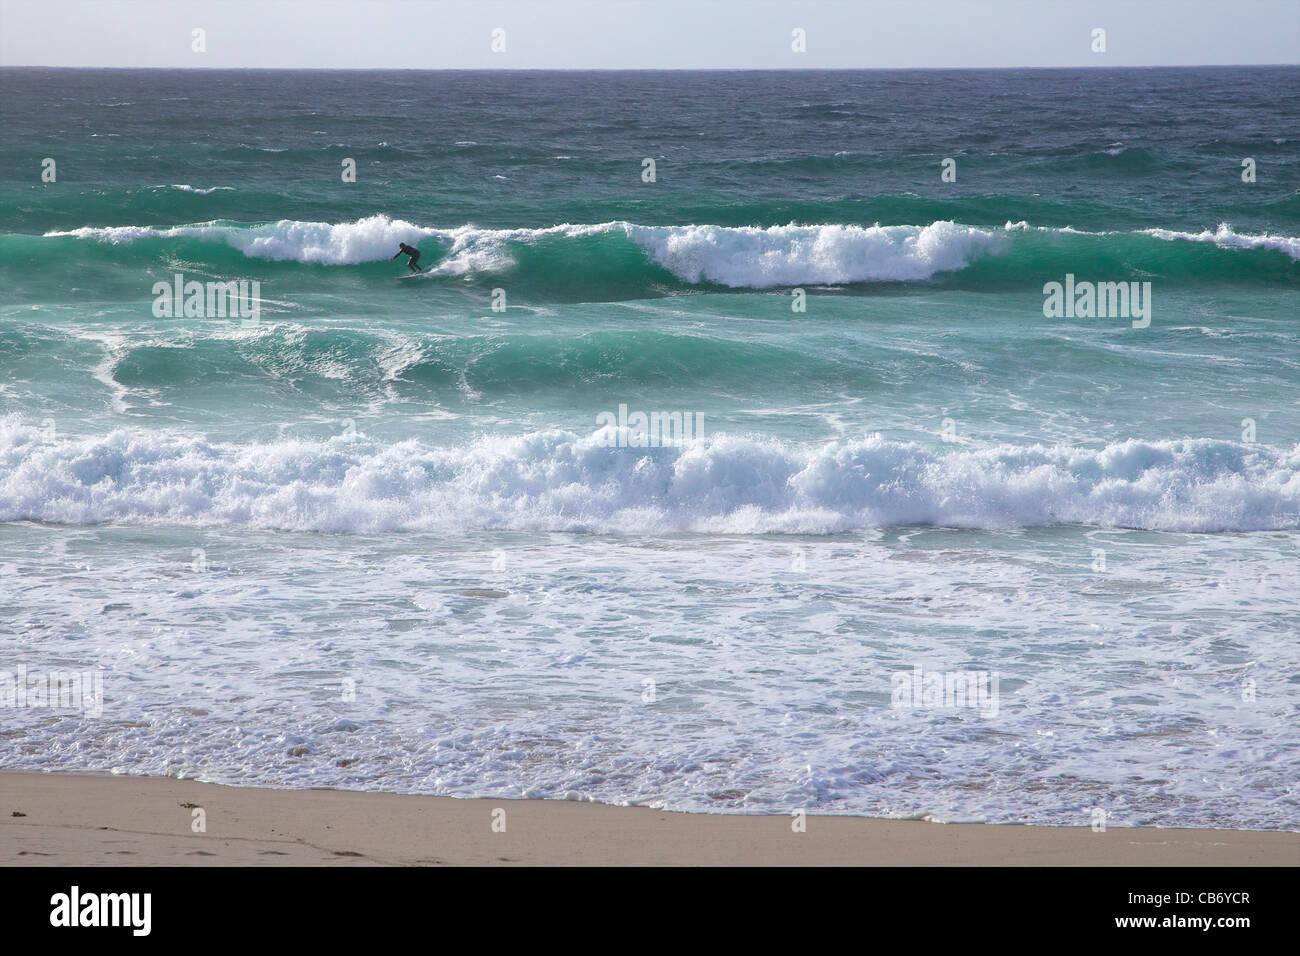 Surfer in rough seas off Porthmeor beach, St Ives, Cornwall, Southwest England, UK, United Kingdom, GB, Great Britain - Stock Image